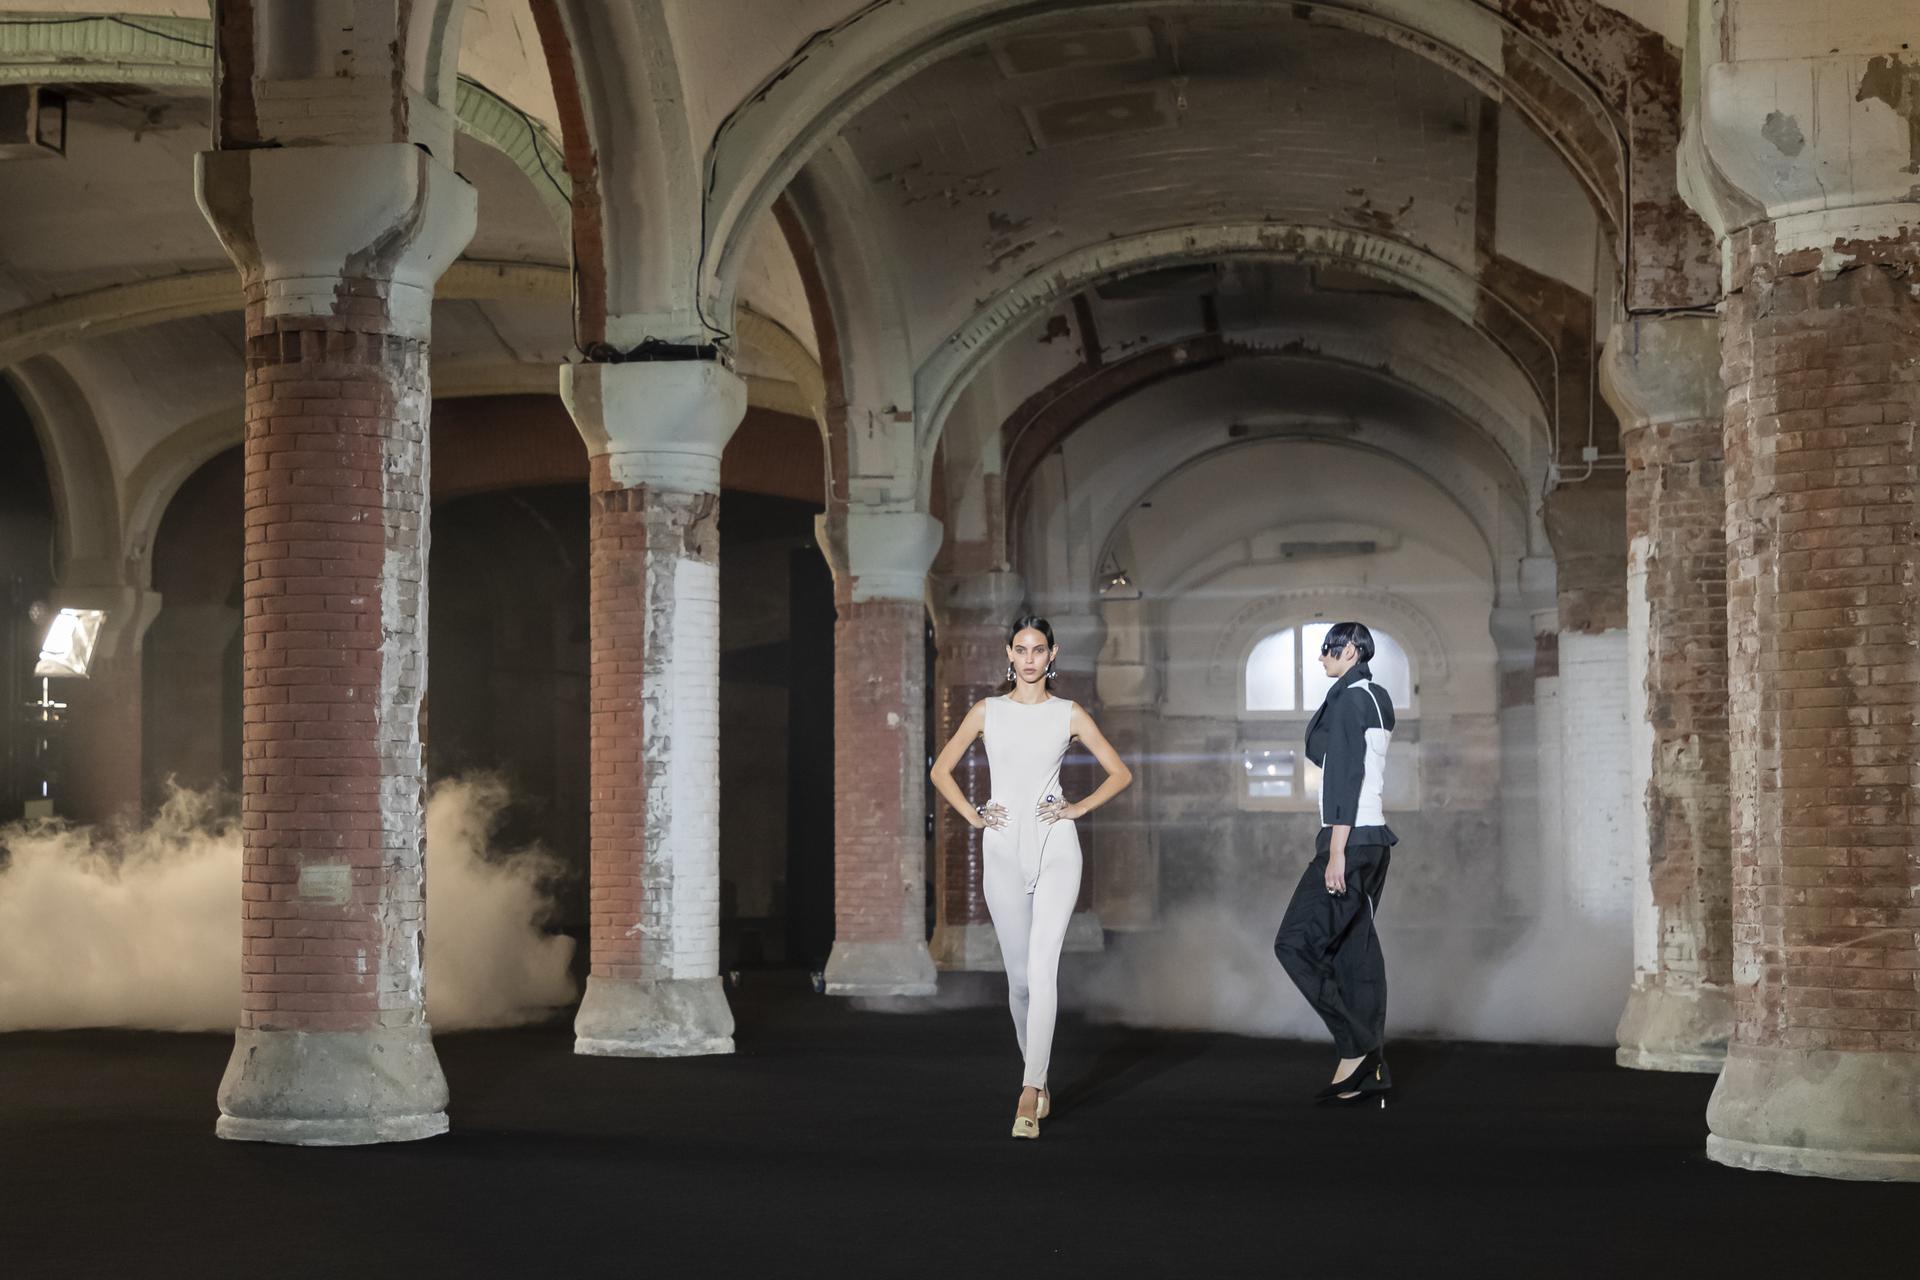 Onrush%20W23FH%20ambient 1059 2 - Tercera sesión de 080 Barcelona Fashion Digital Edition